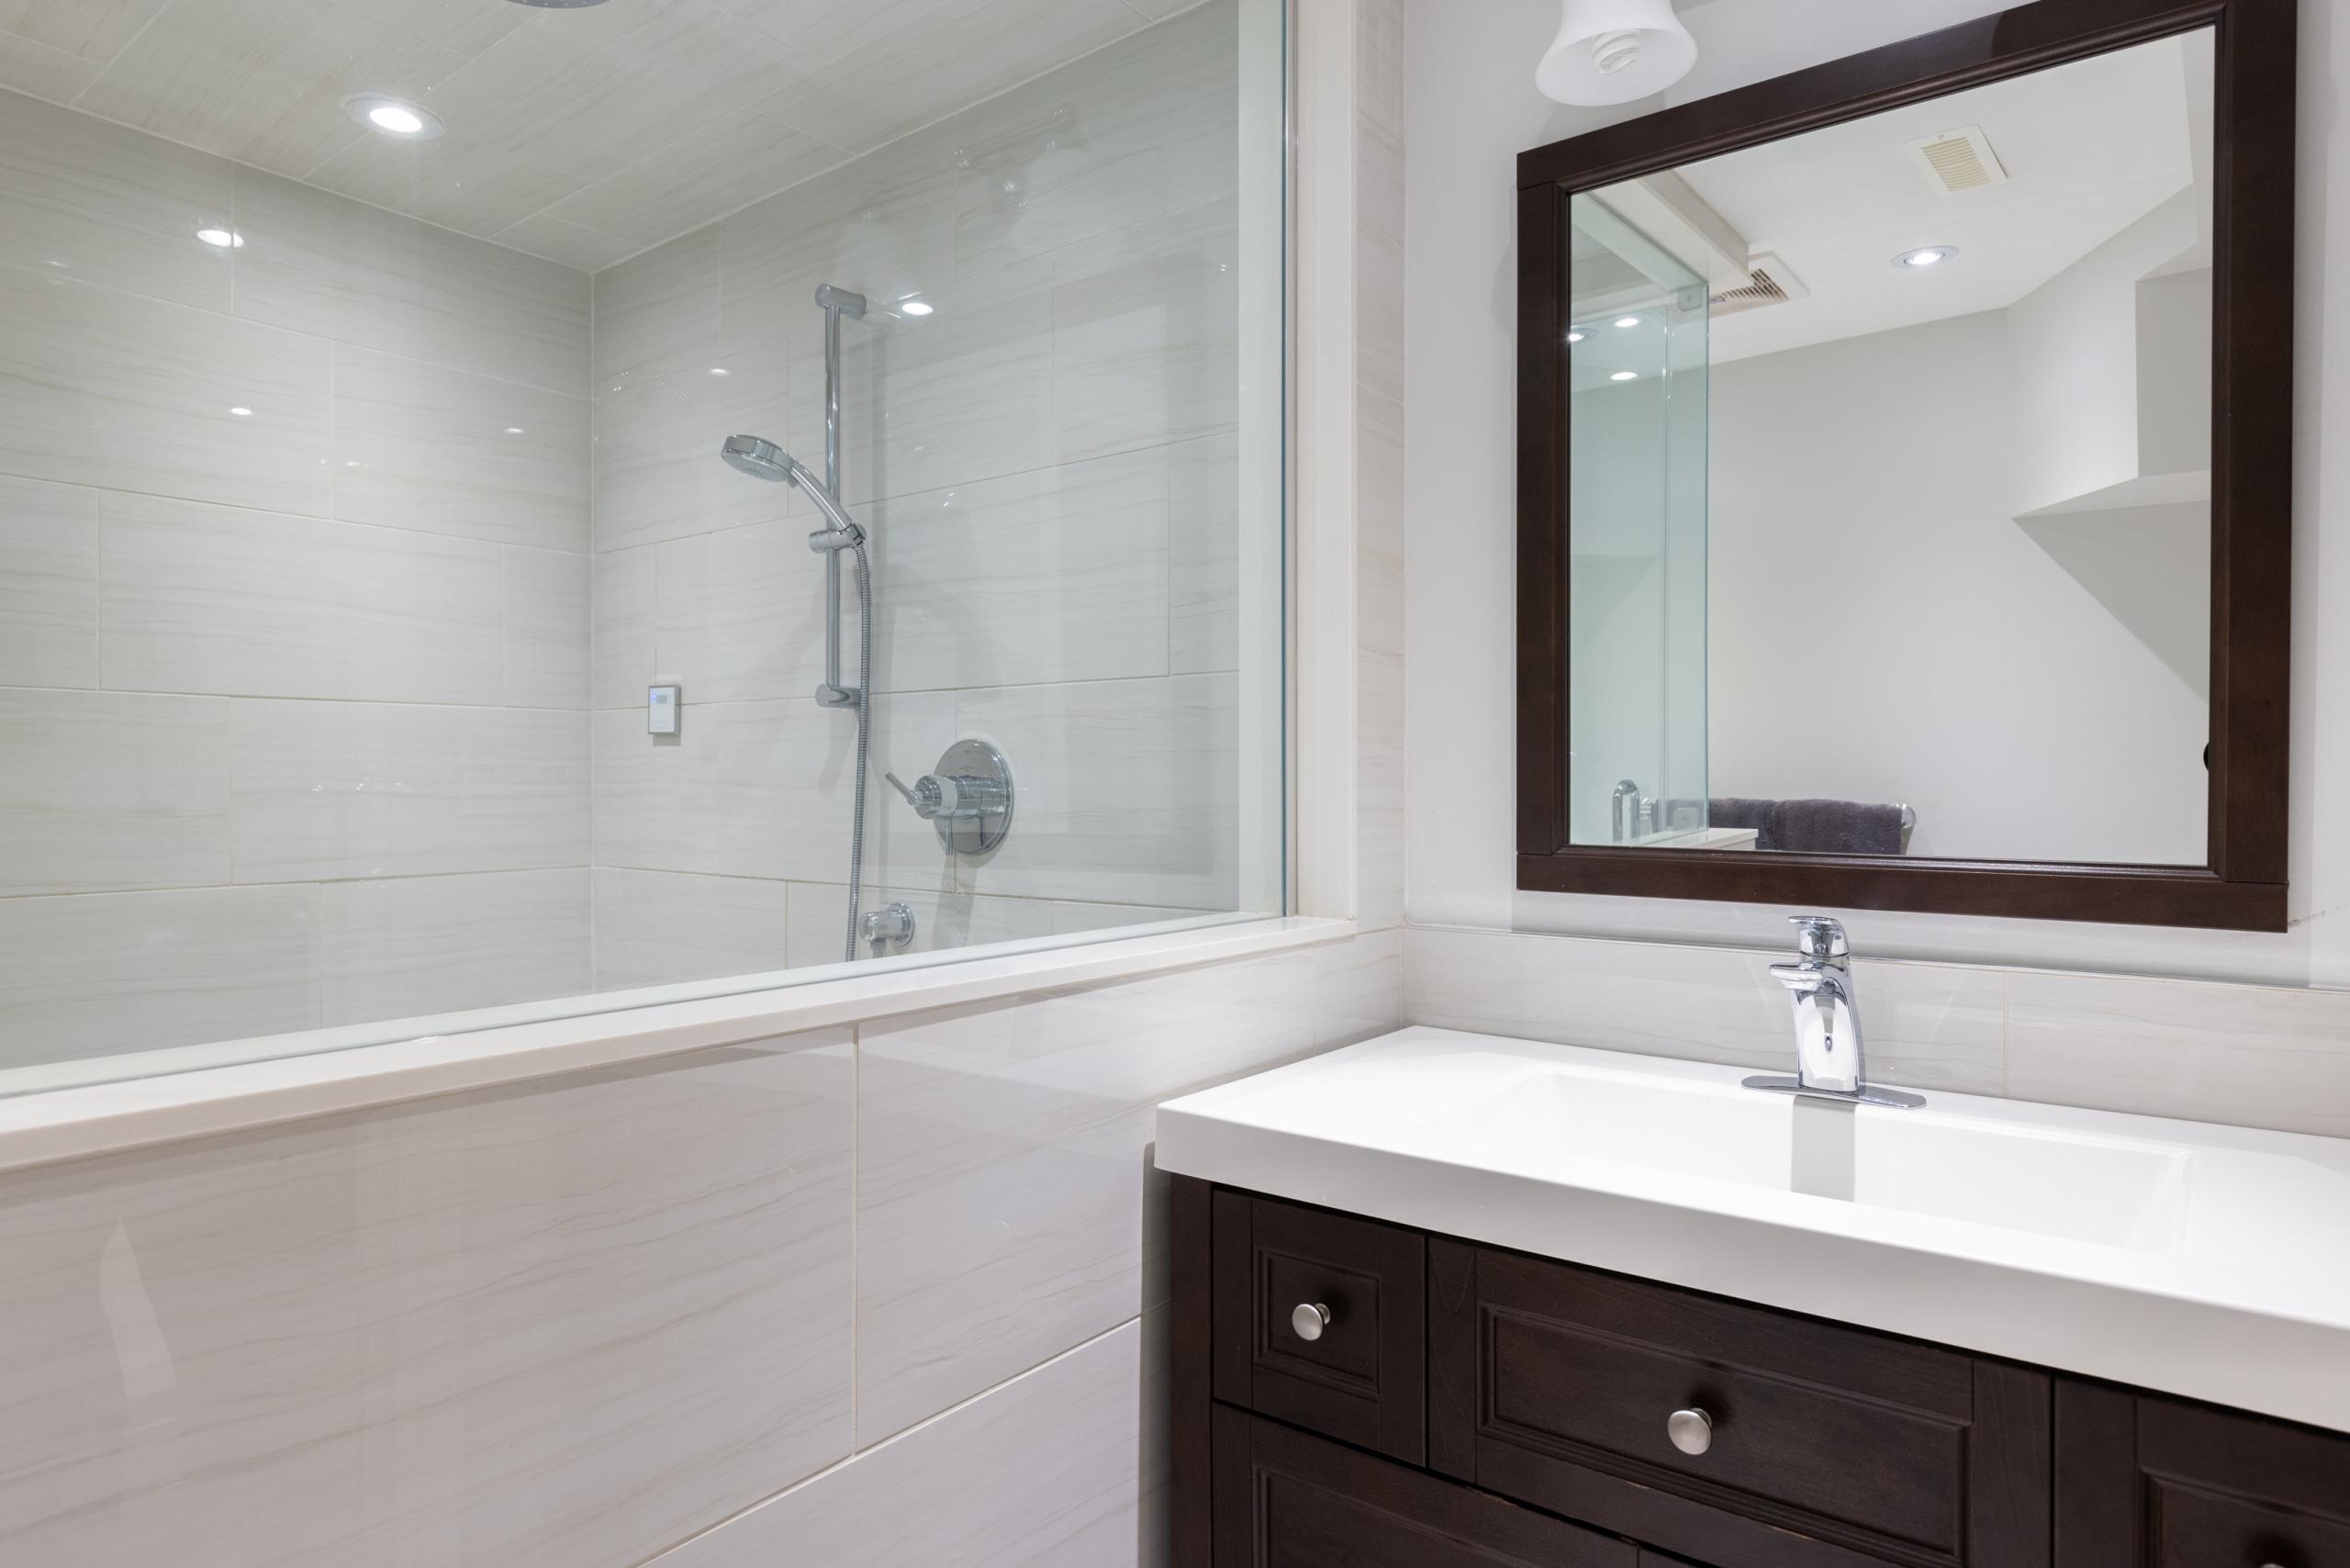 Bathroom featured at 3505 Quilter Court, Burlington, ON at Alex Irish & Associates